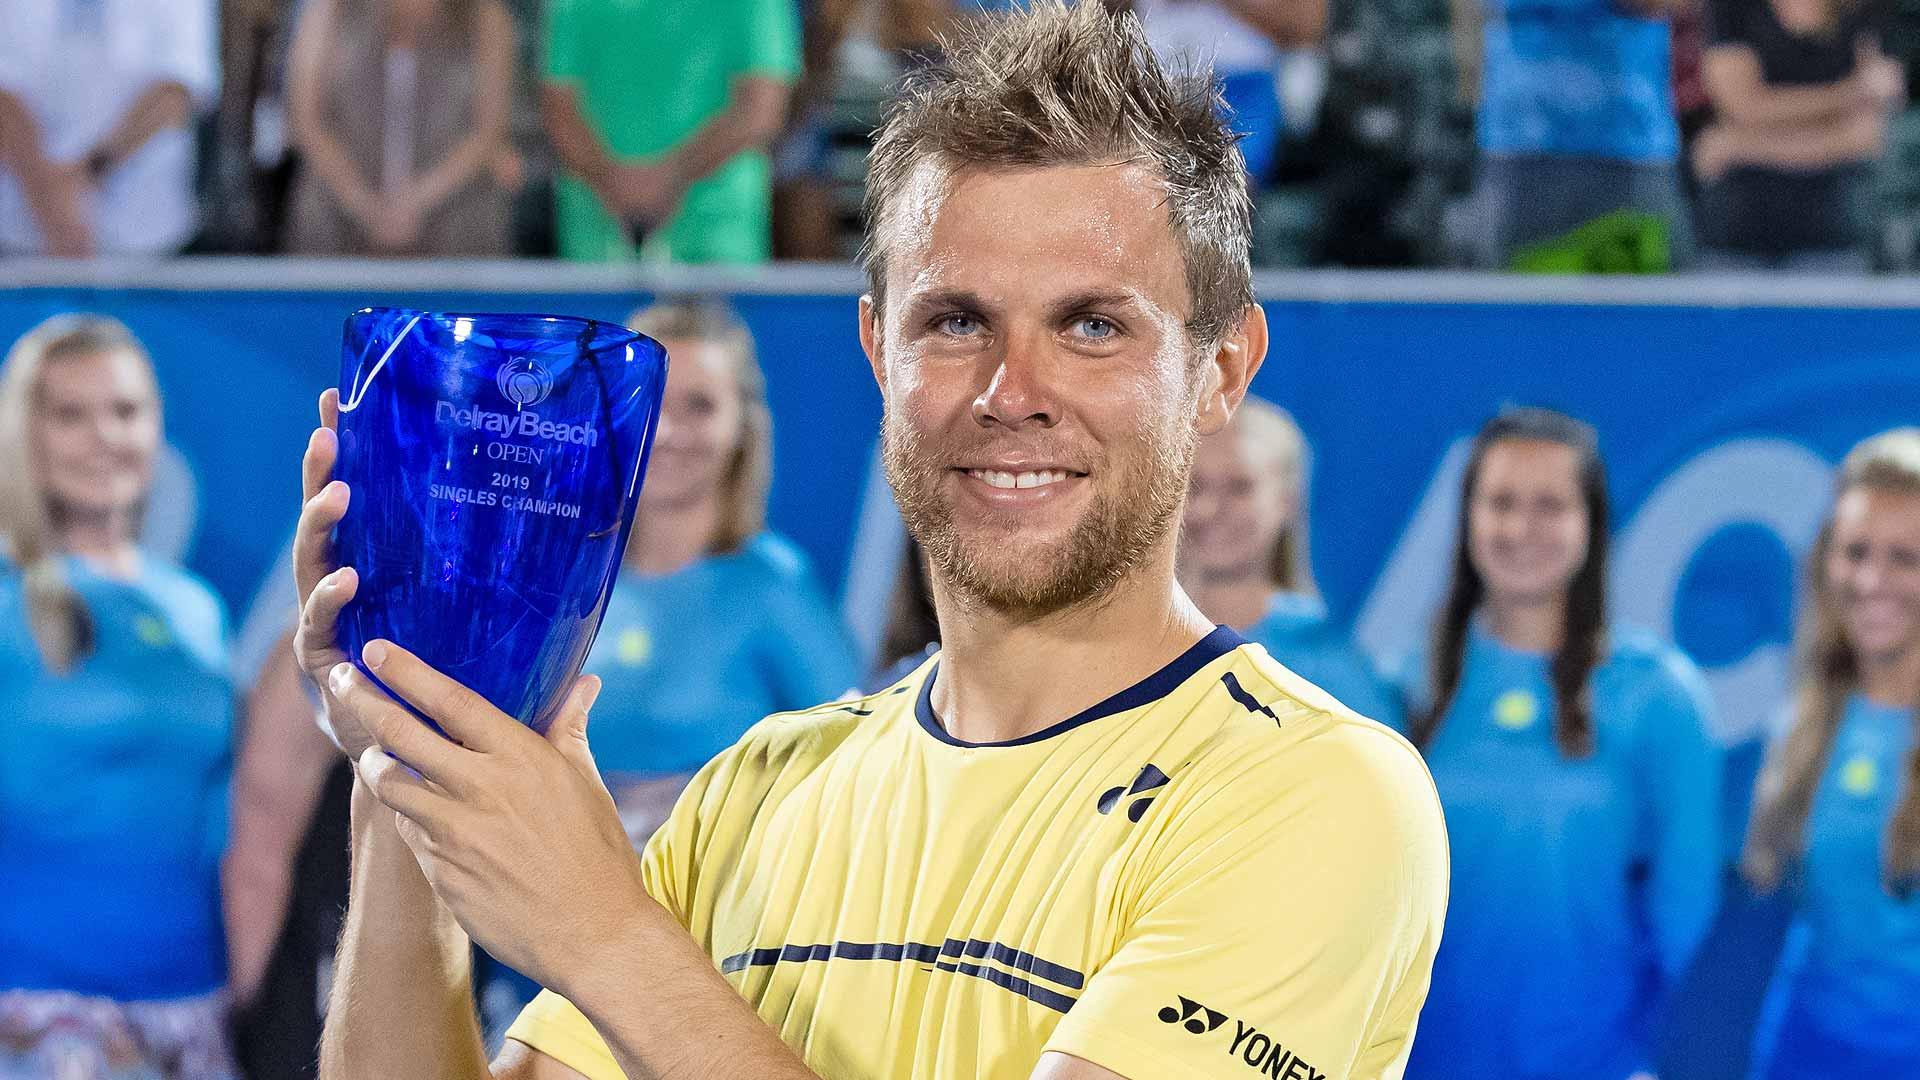 Radu Albot lifts his first ATP Tour trophy.